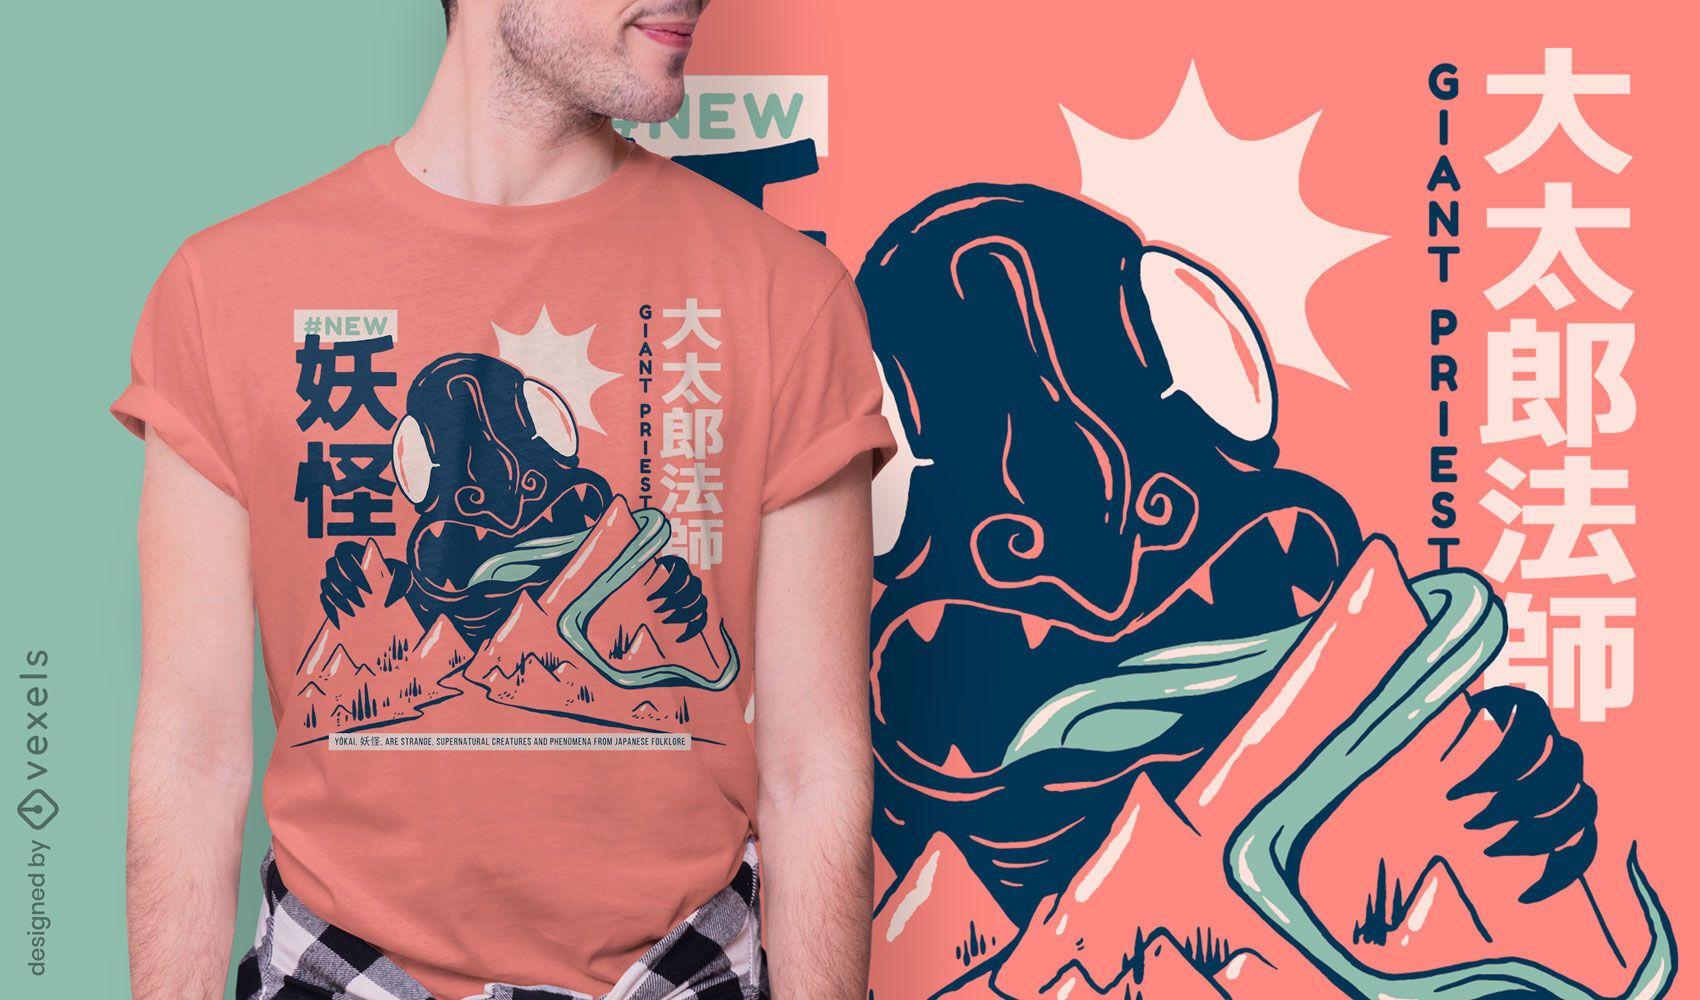 Daidarabotchi japanisches Yokai T-Shirt Design